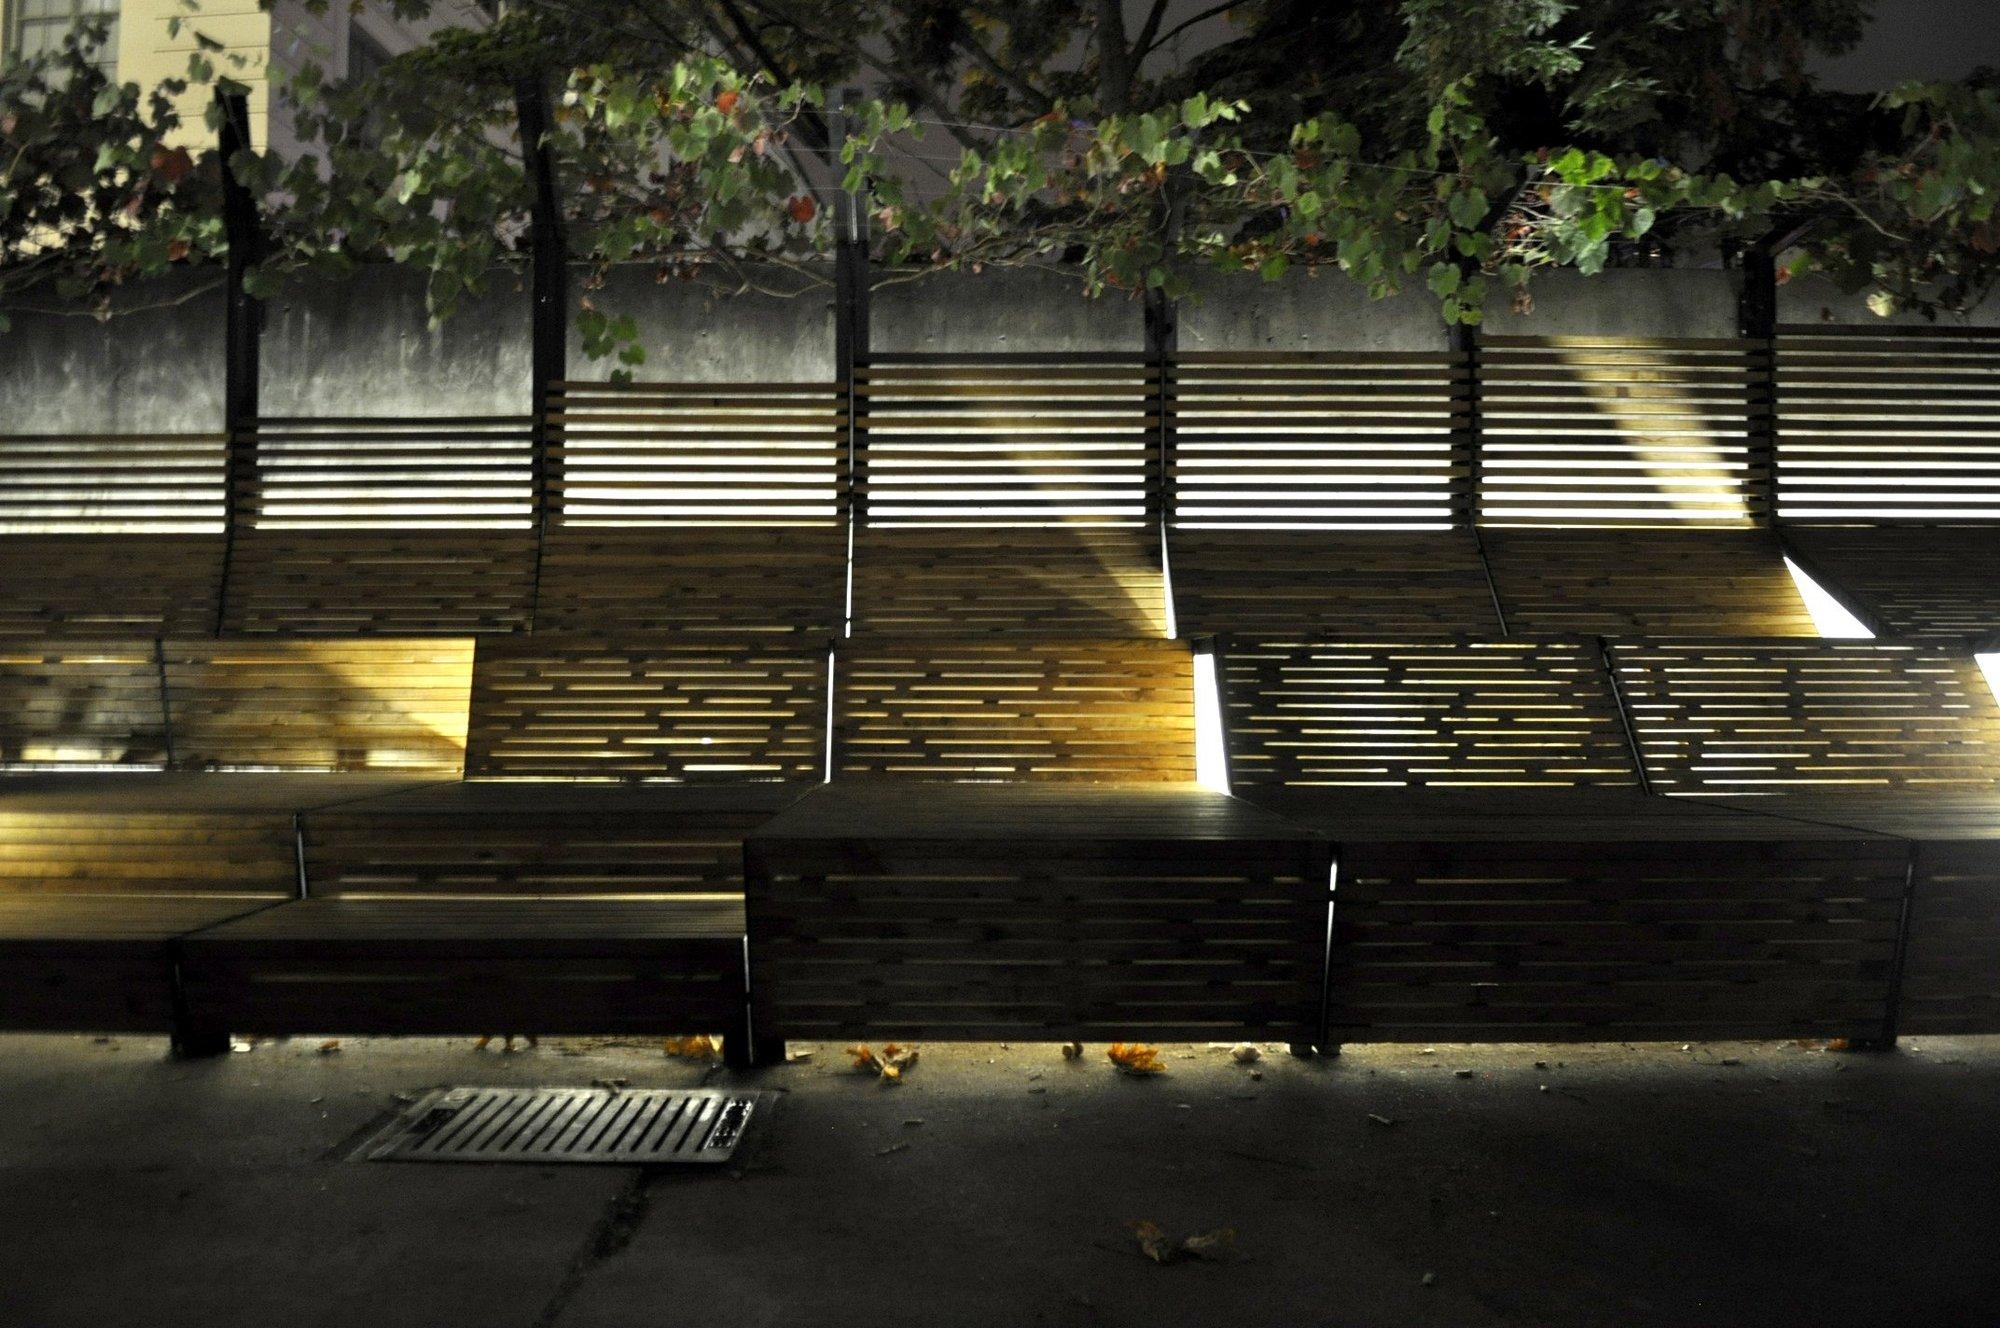 Incroyable Wurstershire Sauce / UC Berkeley Landscape And Architecture Graduate  Student Team